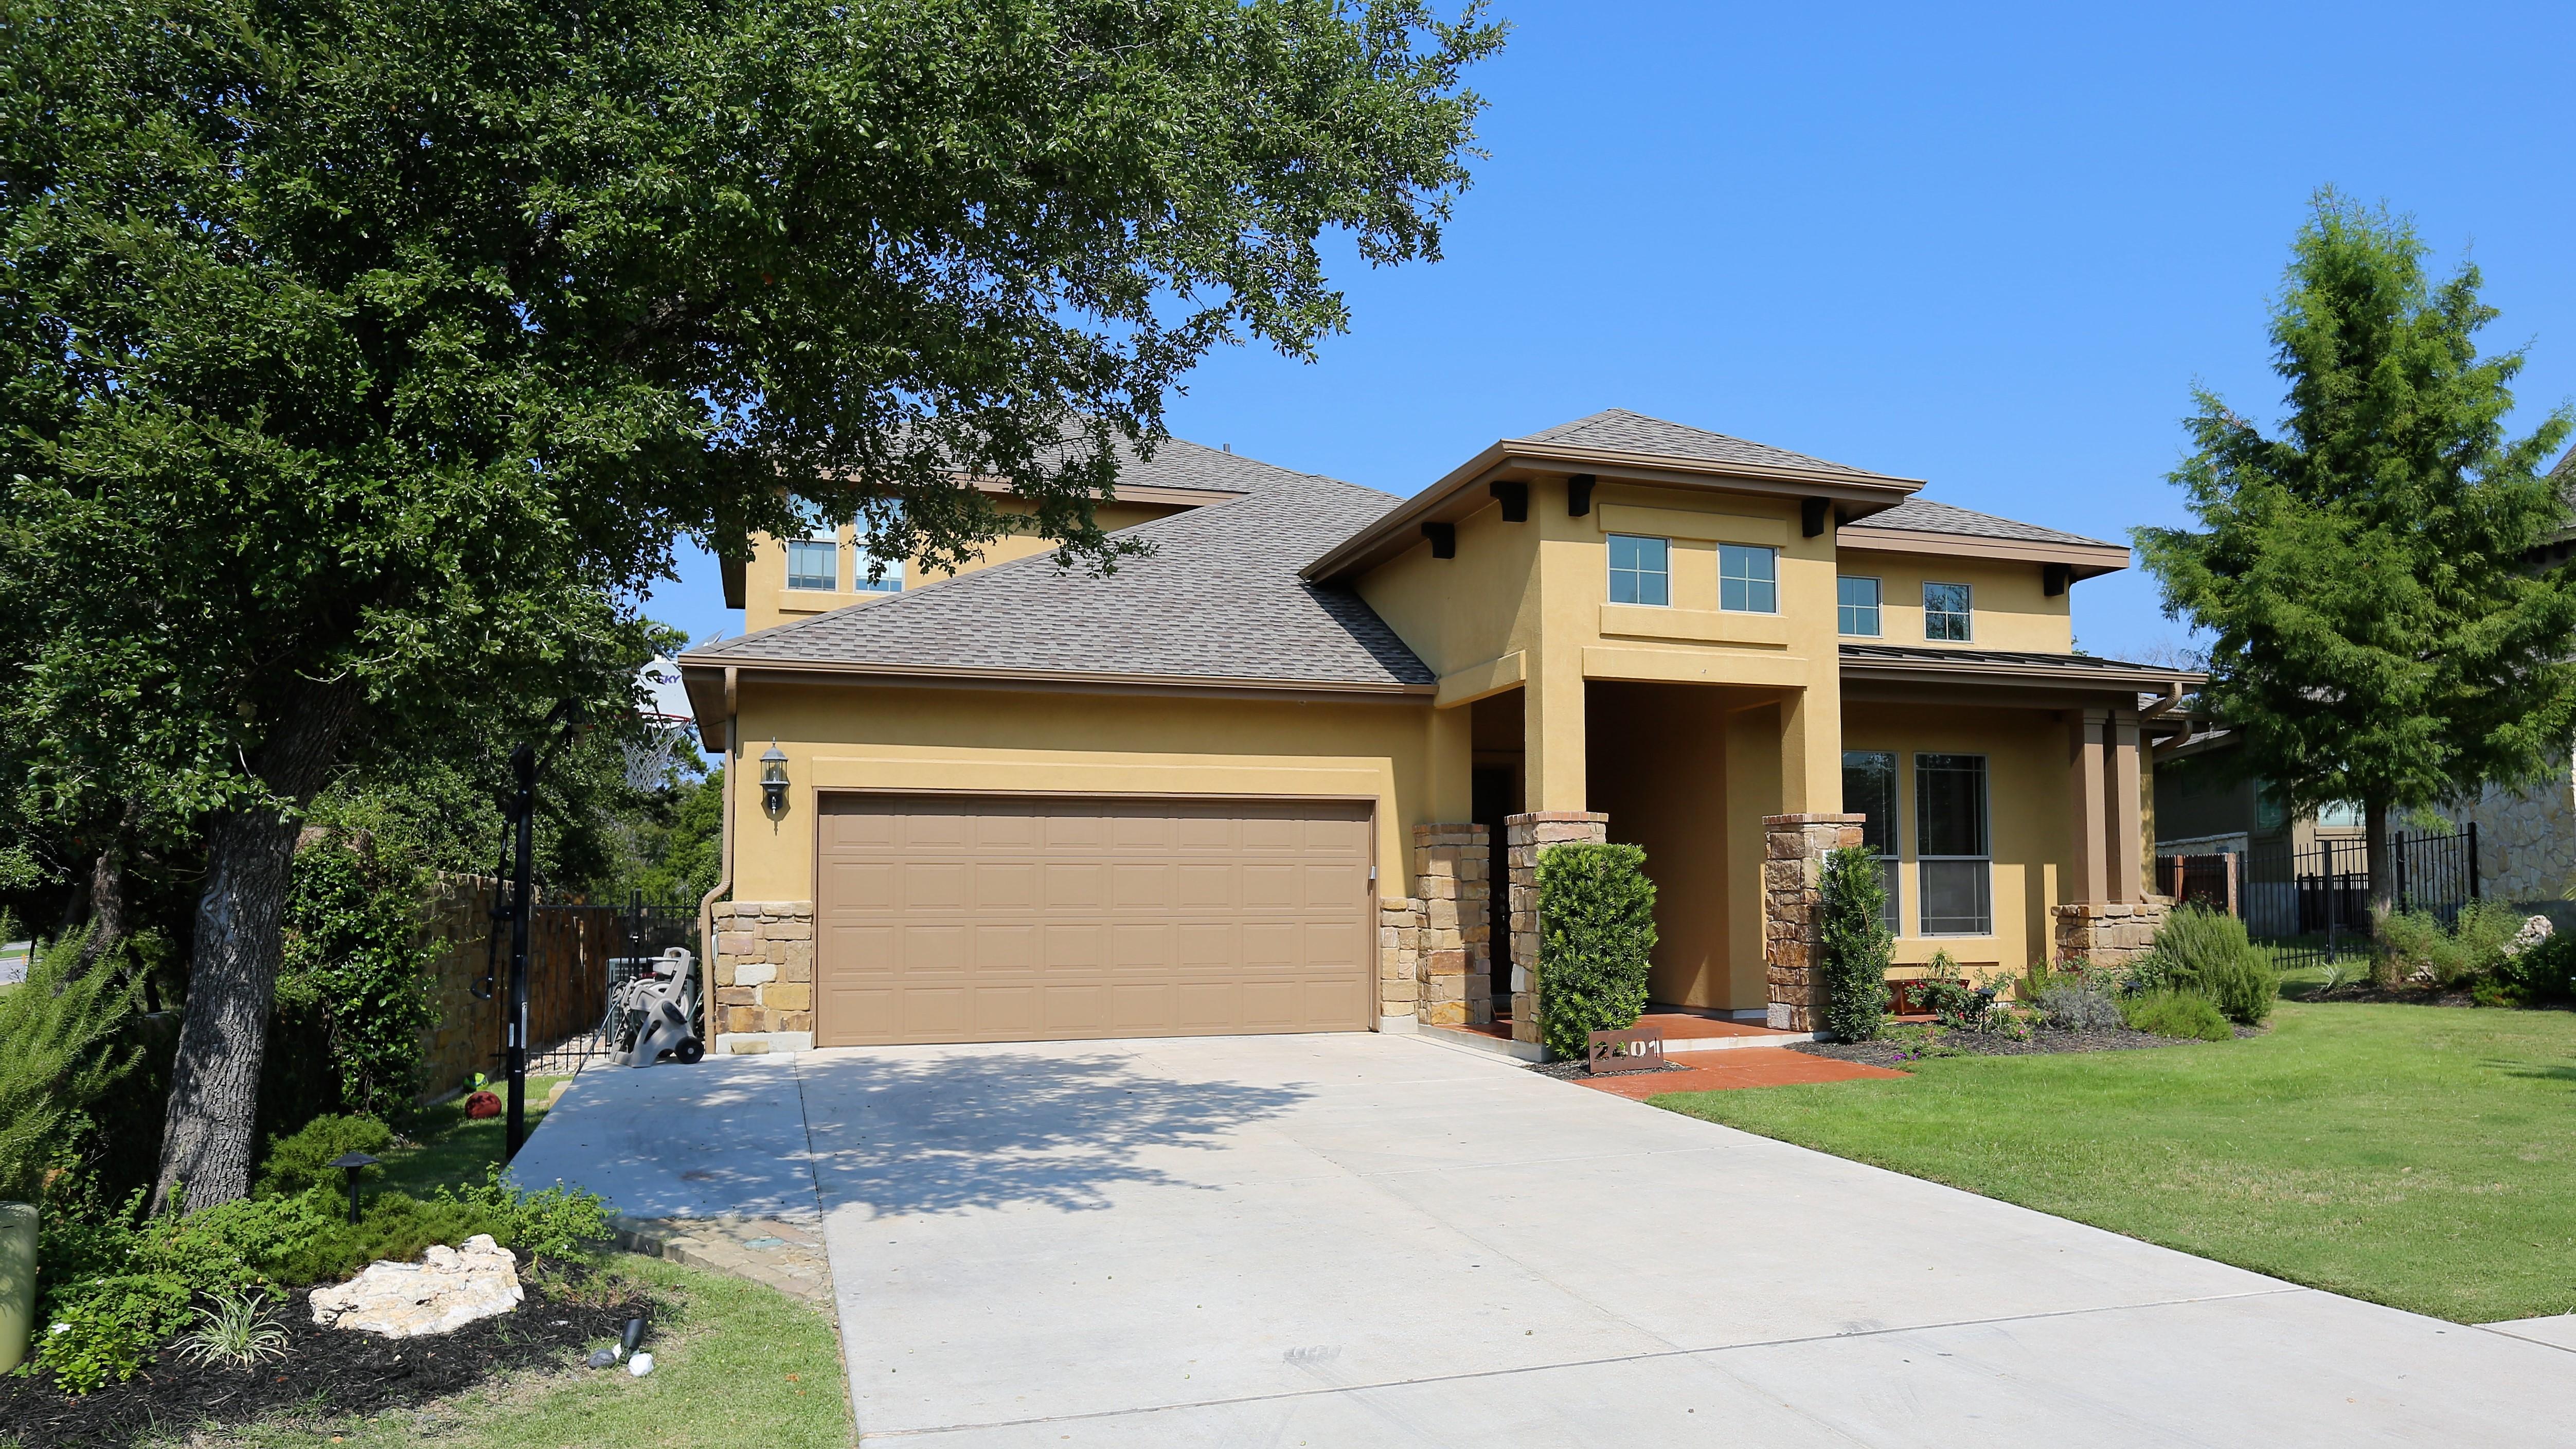 Reserve at Brushy Creek Home, Cedar Park TX